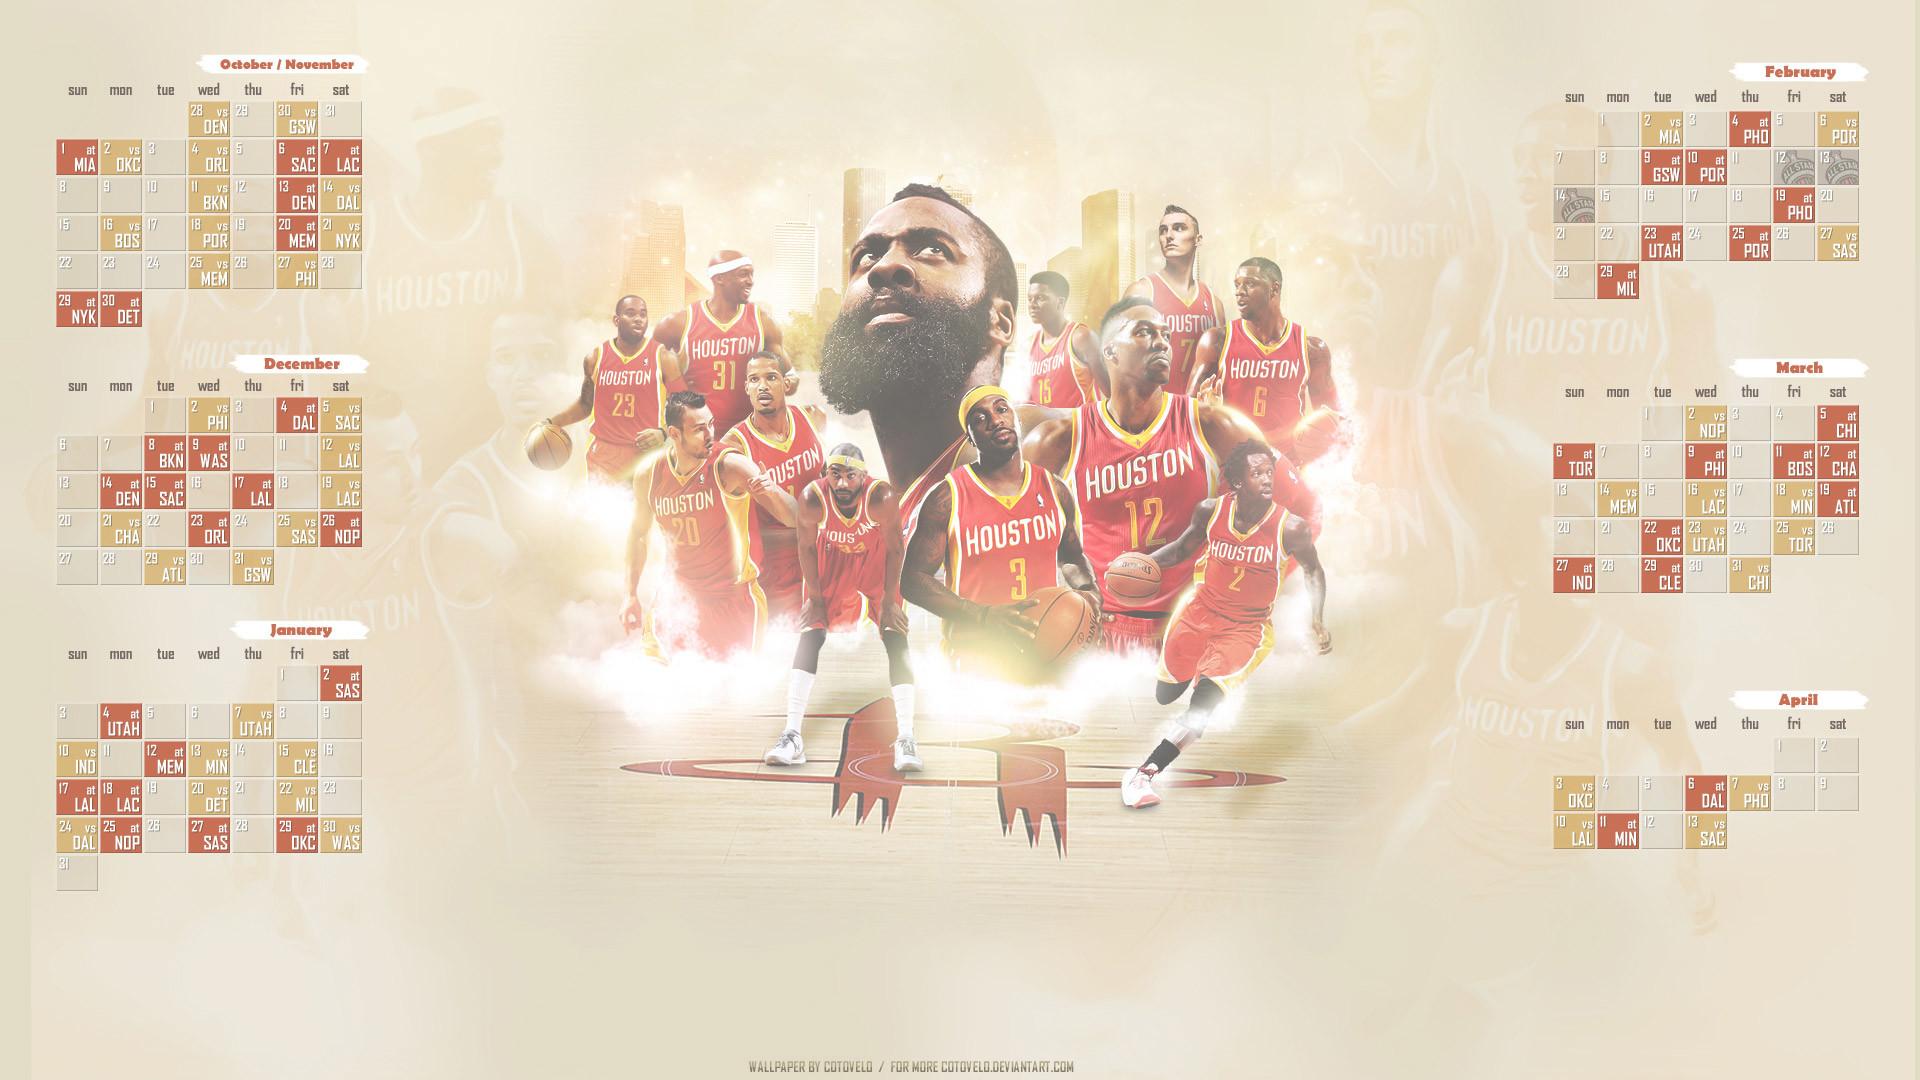 Houston Rockets Schedule 2015-2016 Wallpaper